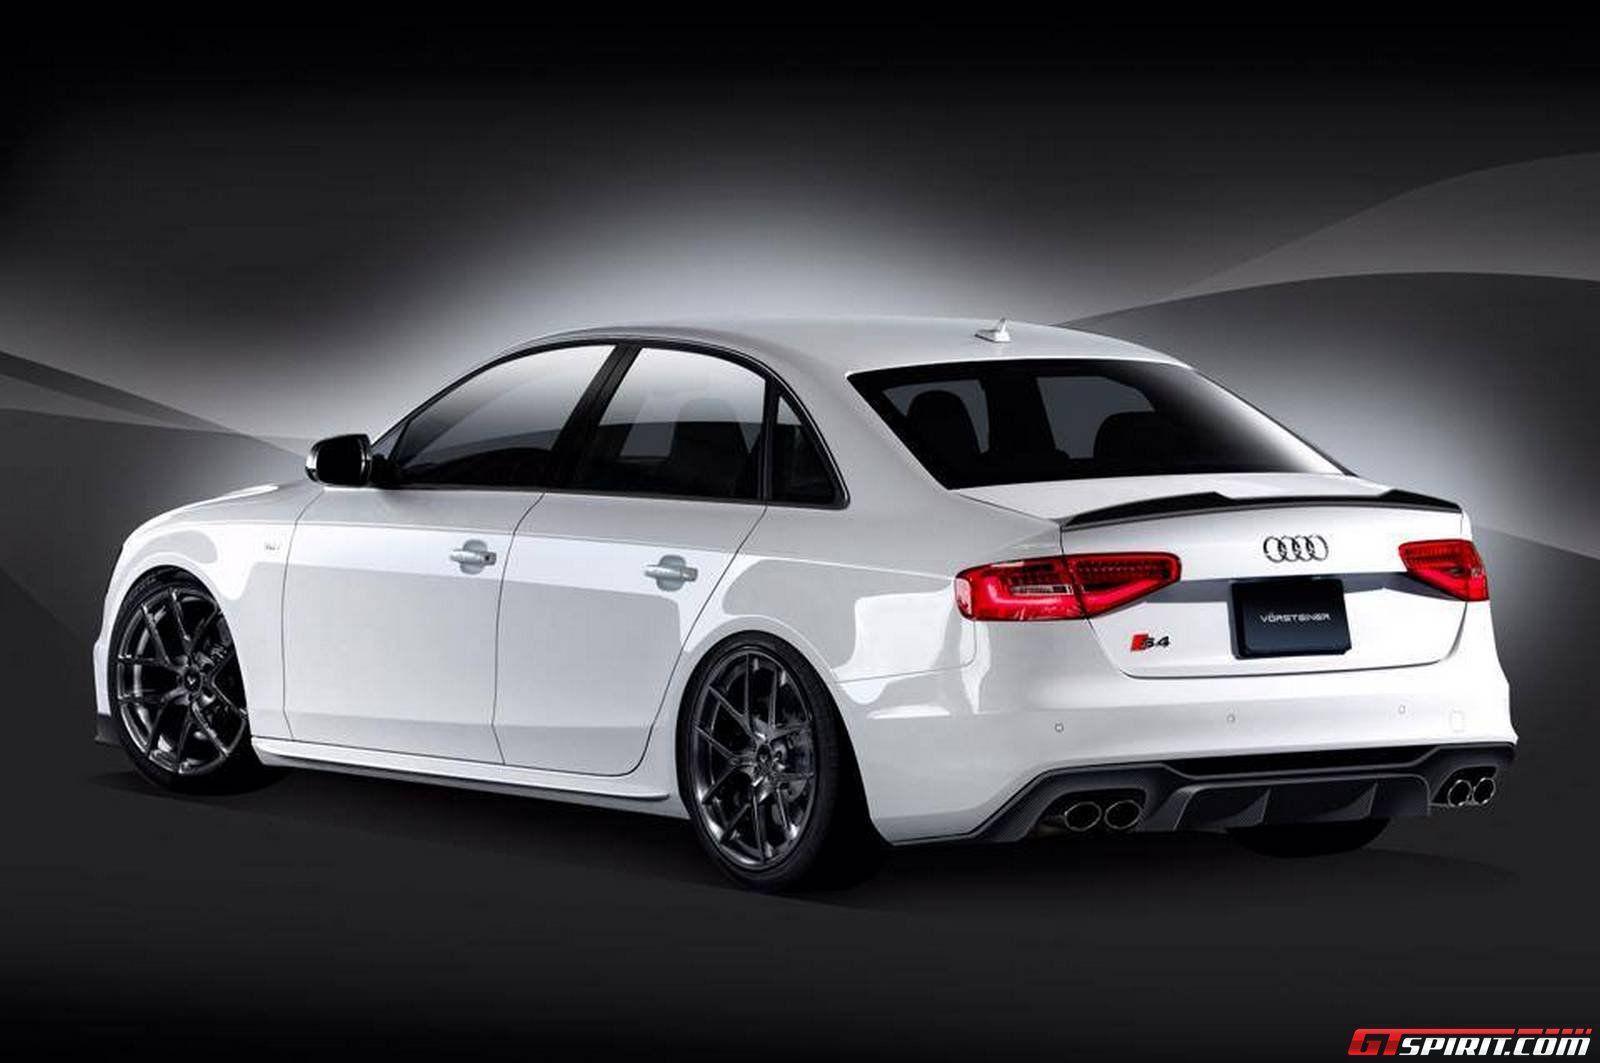 Review 2015 Audi S4 2016 New Cars Audi S4 Audi Quattro Audi